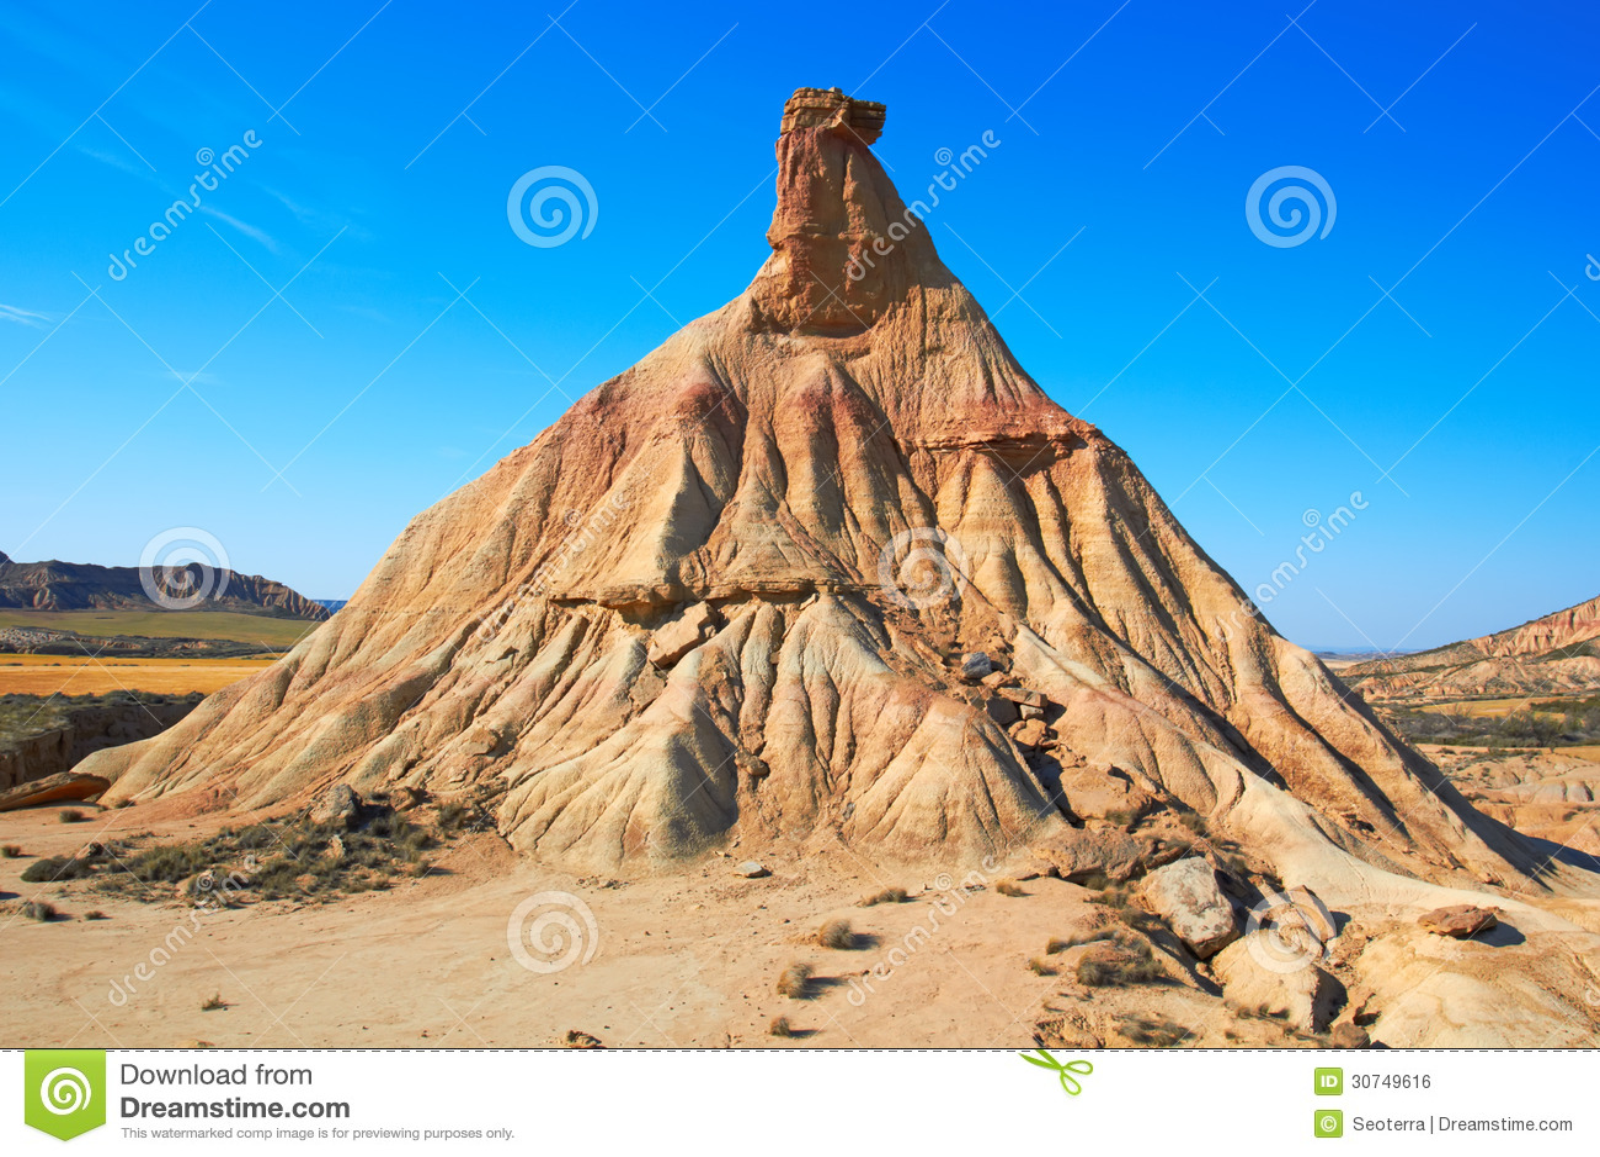 famous landmark of bardenas reales desert royalty free stock image image 30749616. Black Bedroom Furniture Sets. Home Design Ideas